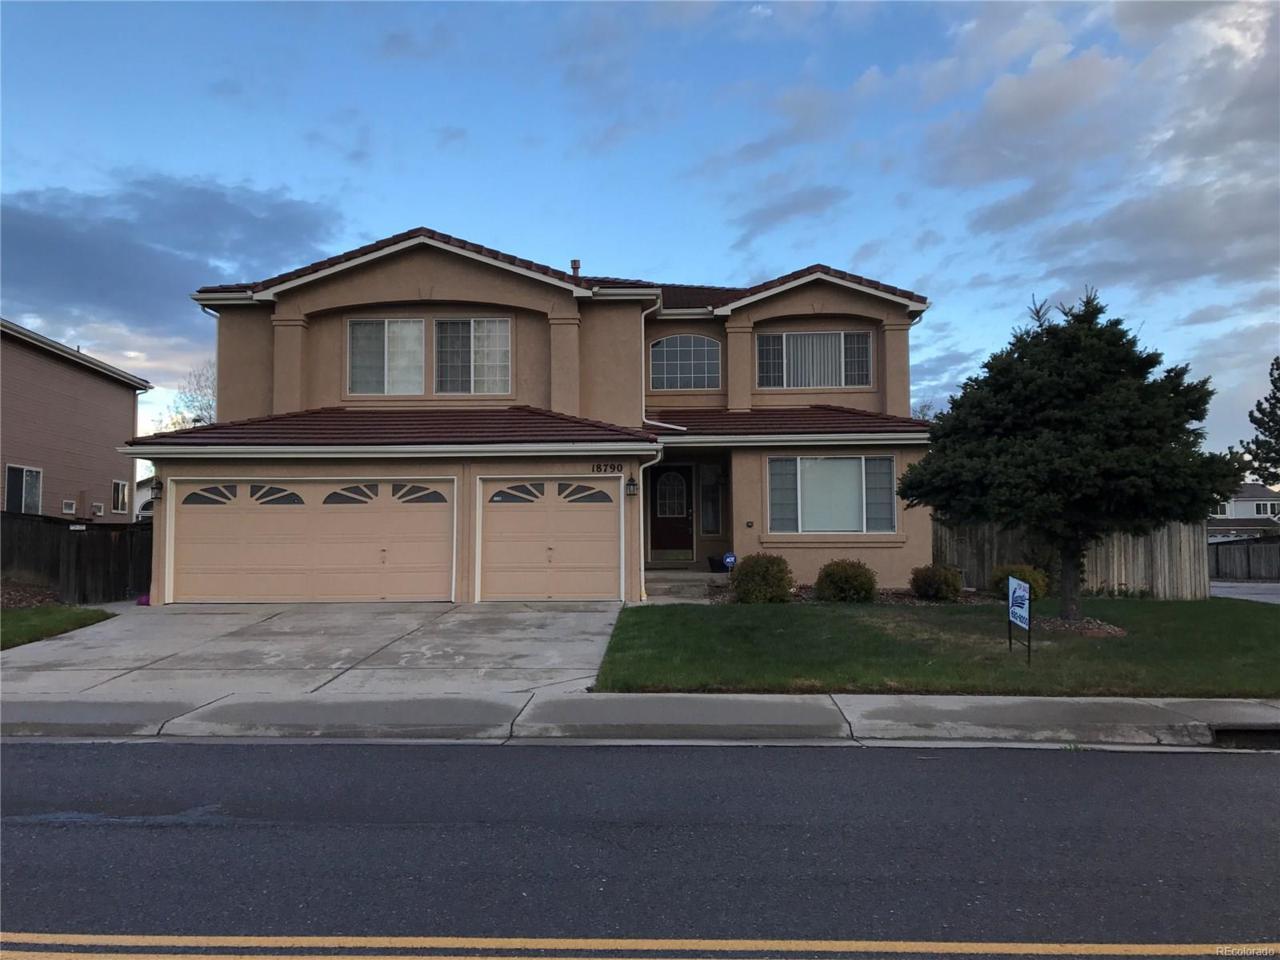 18790 E 43rd Avenue, Denver, CO 80249 (#6347408) :: Thrive Real Estate Group